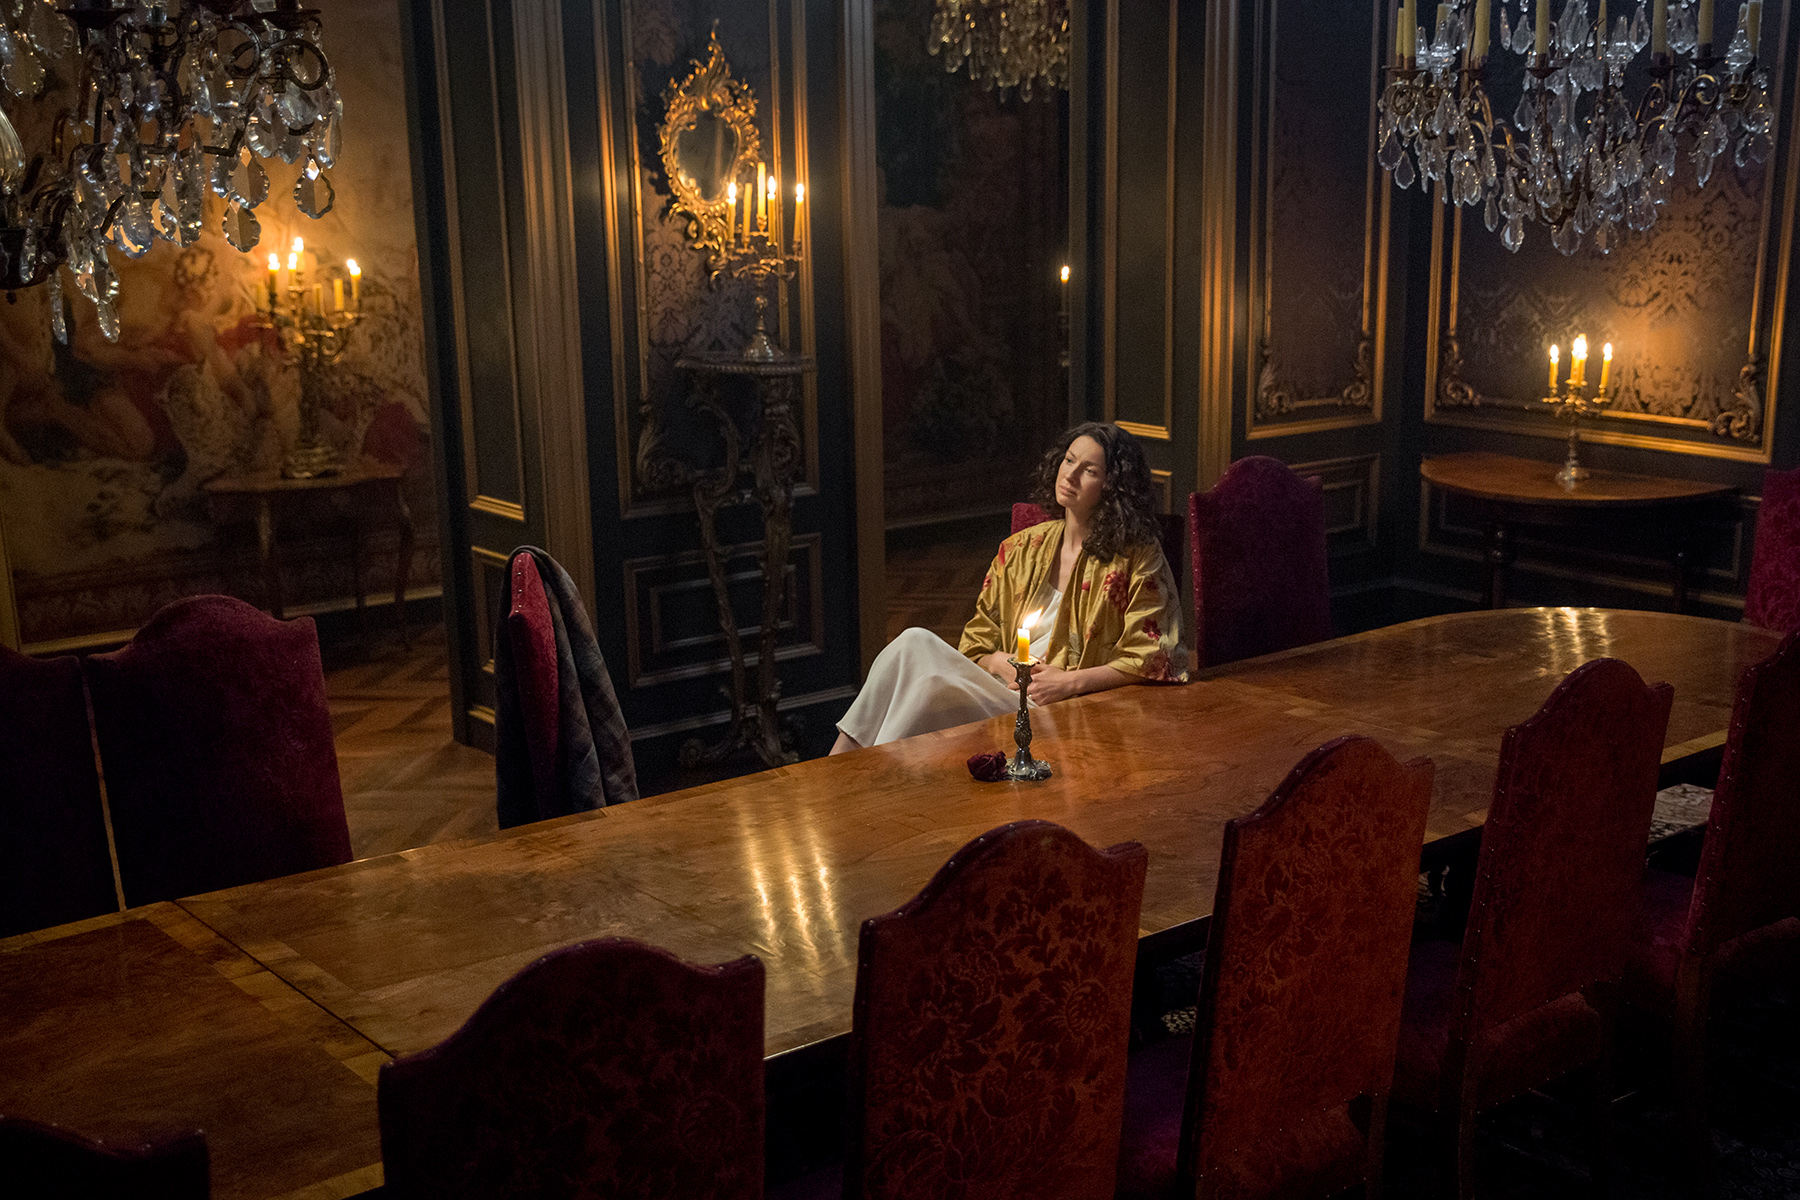 Outlander': Scenes From Season 2, Episode 4 -- 'La Dame